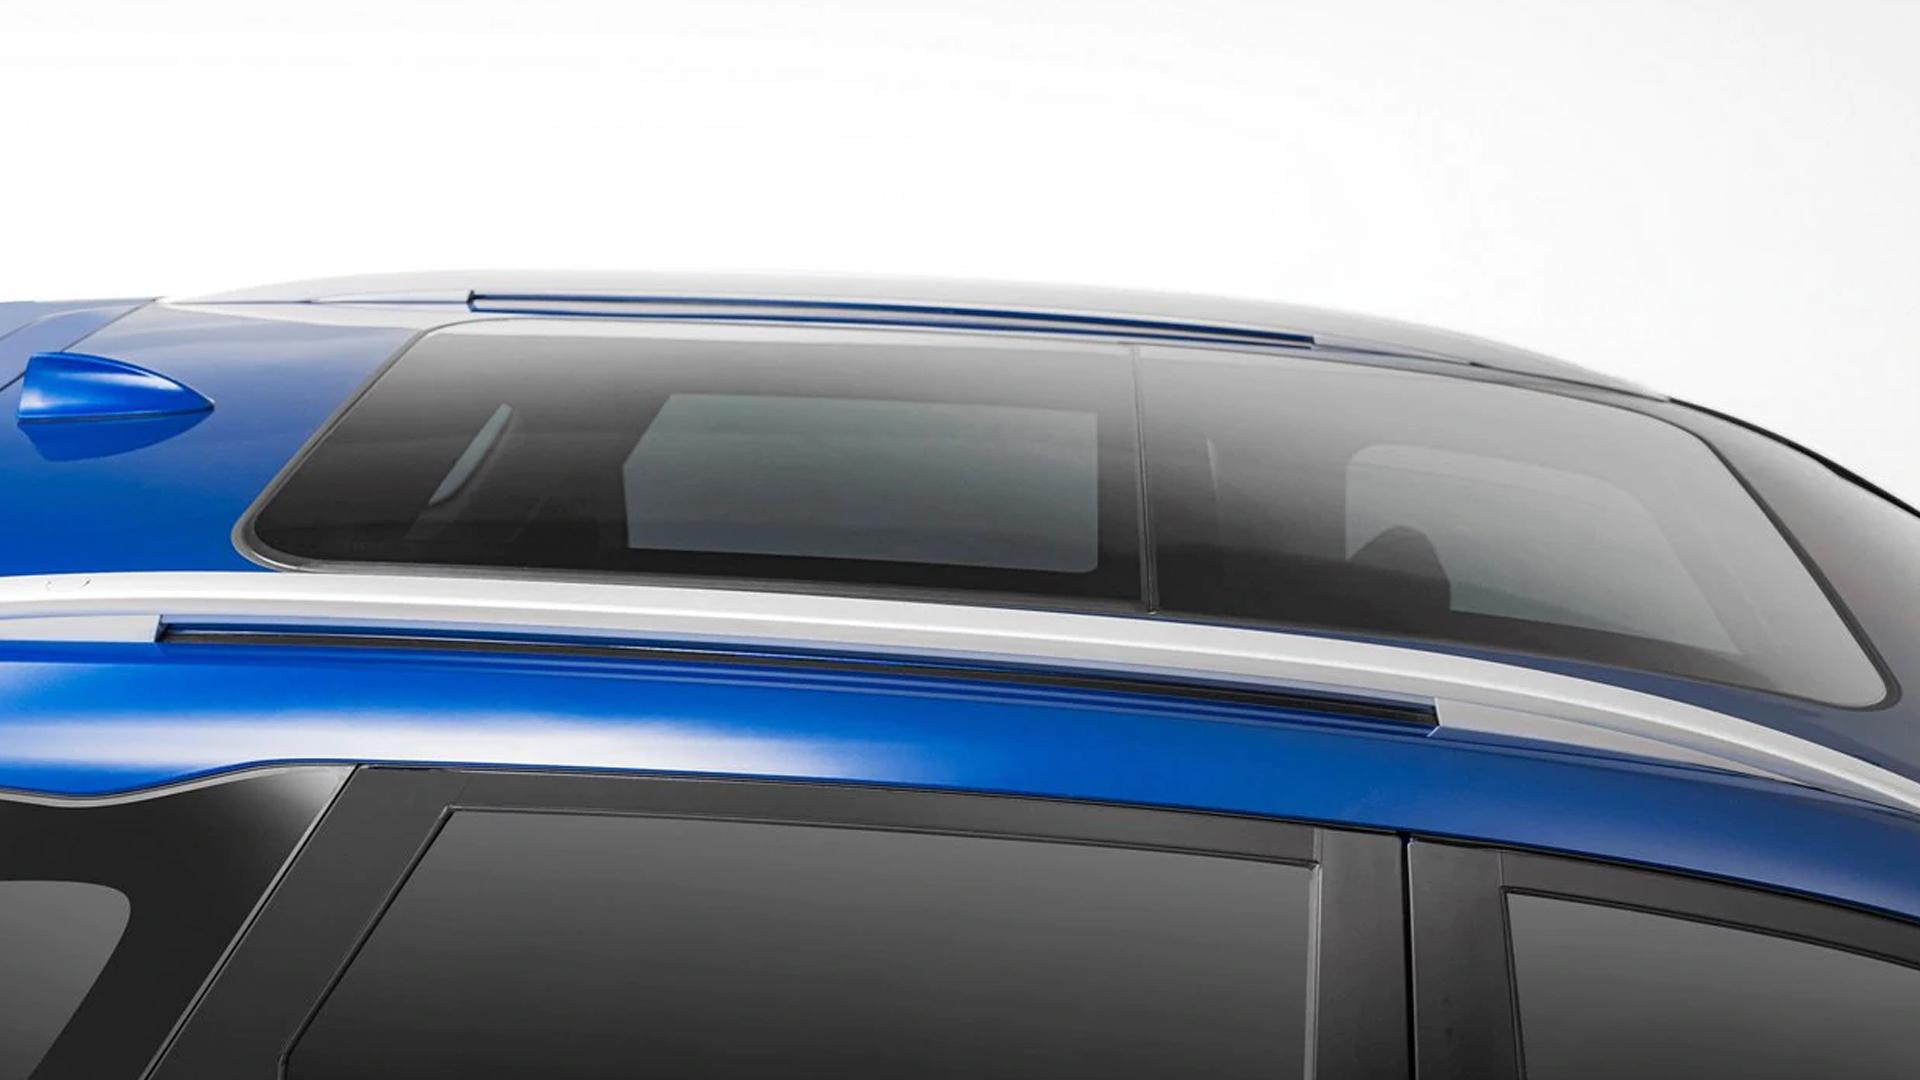 MG Hector Plus 2020 1.5 Petrol Exterior